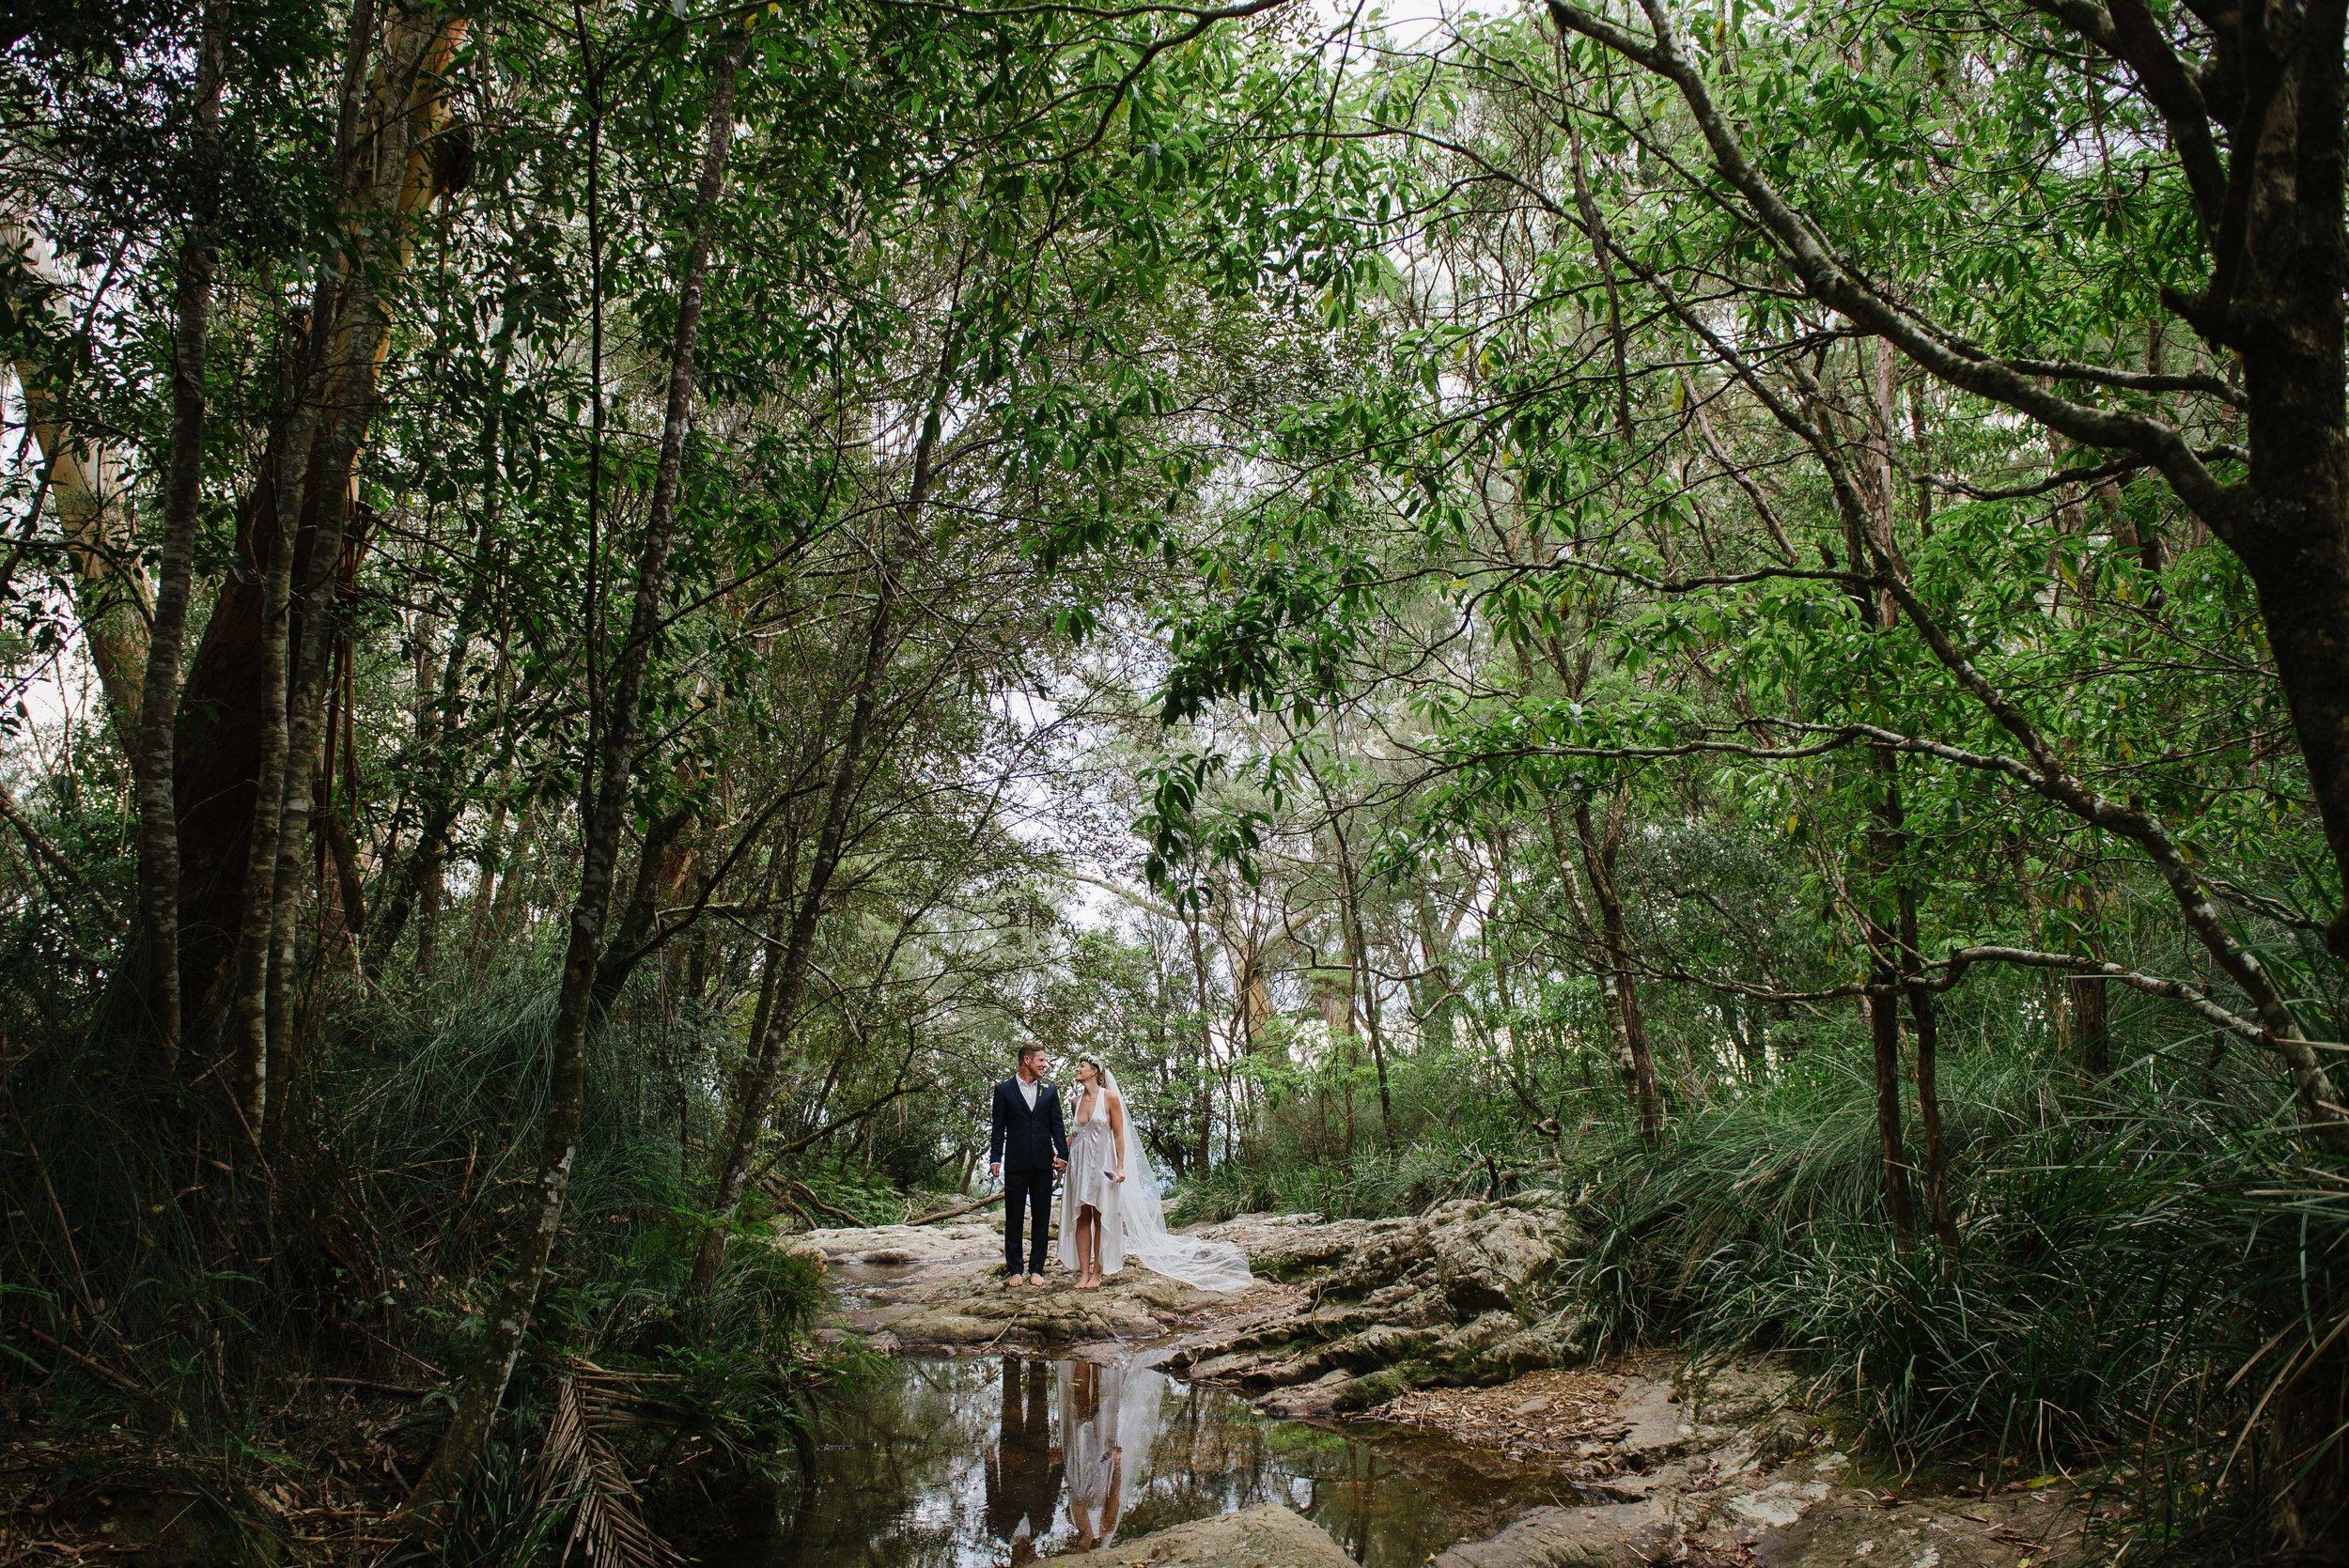 Carla and Luke- wedding photographer, byron bay wedding and family photographer, tweed heads wedding and family photography-263.jpg